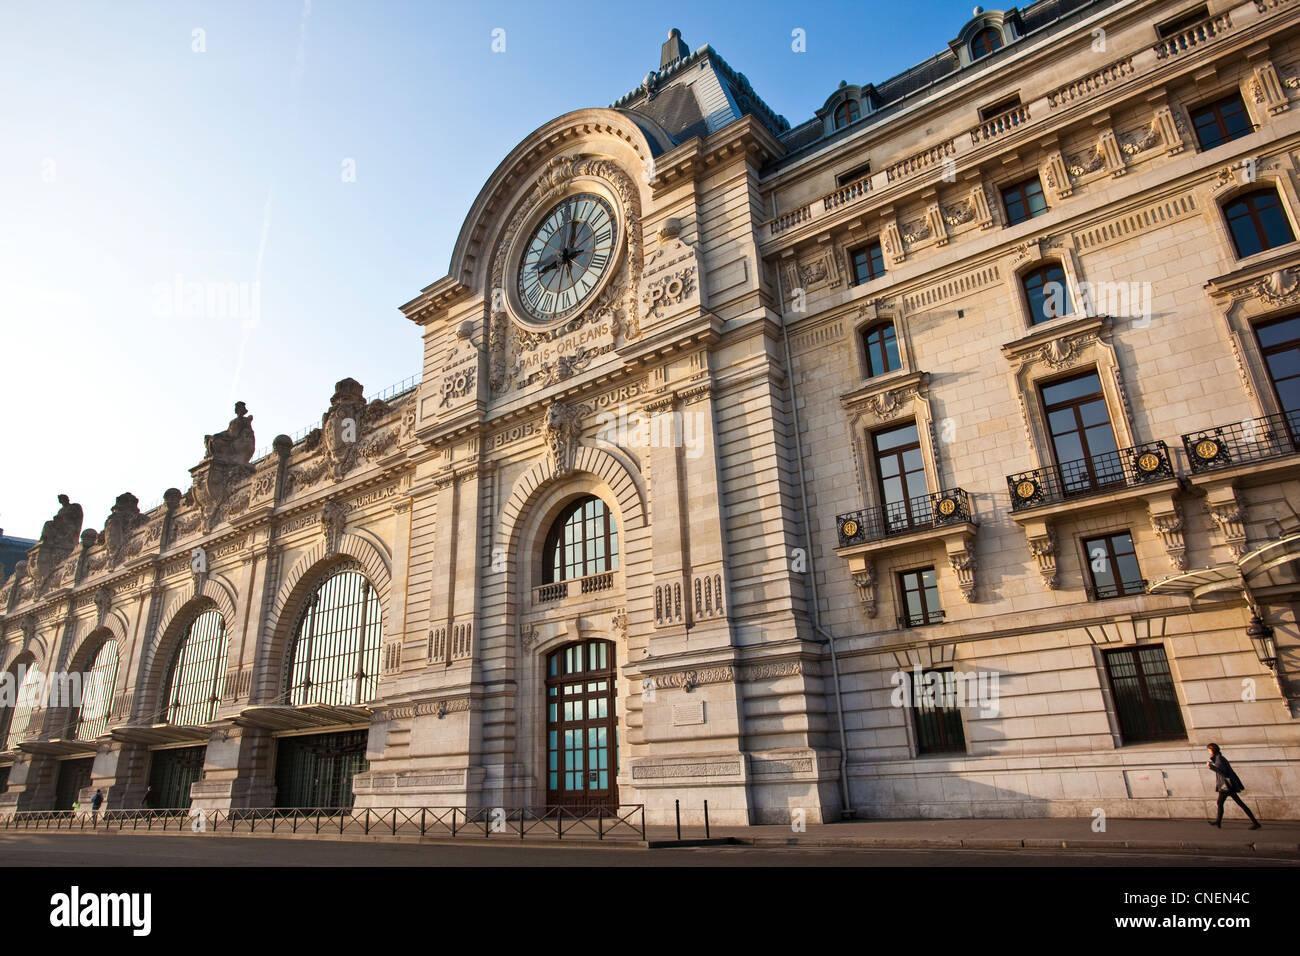 Musee d'Orsay clock face, Paris France - Stock Image